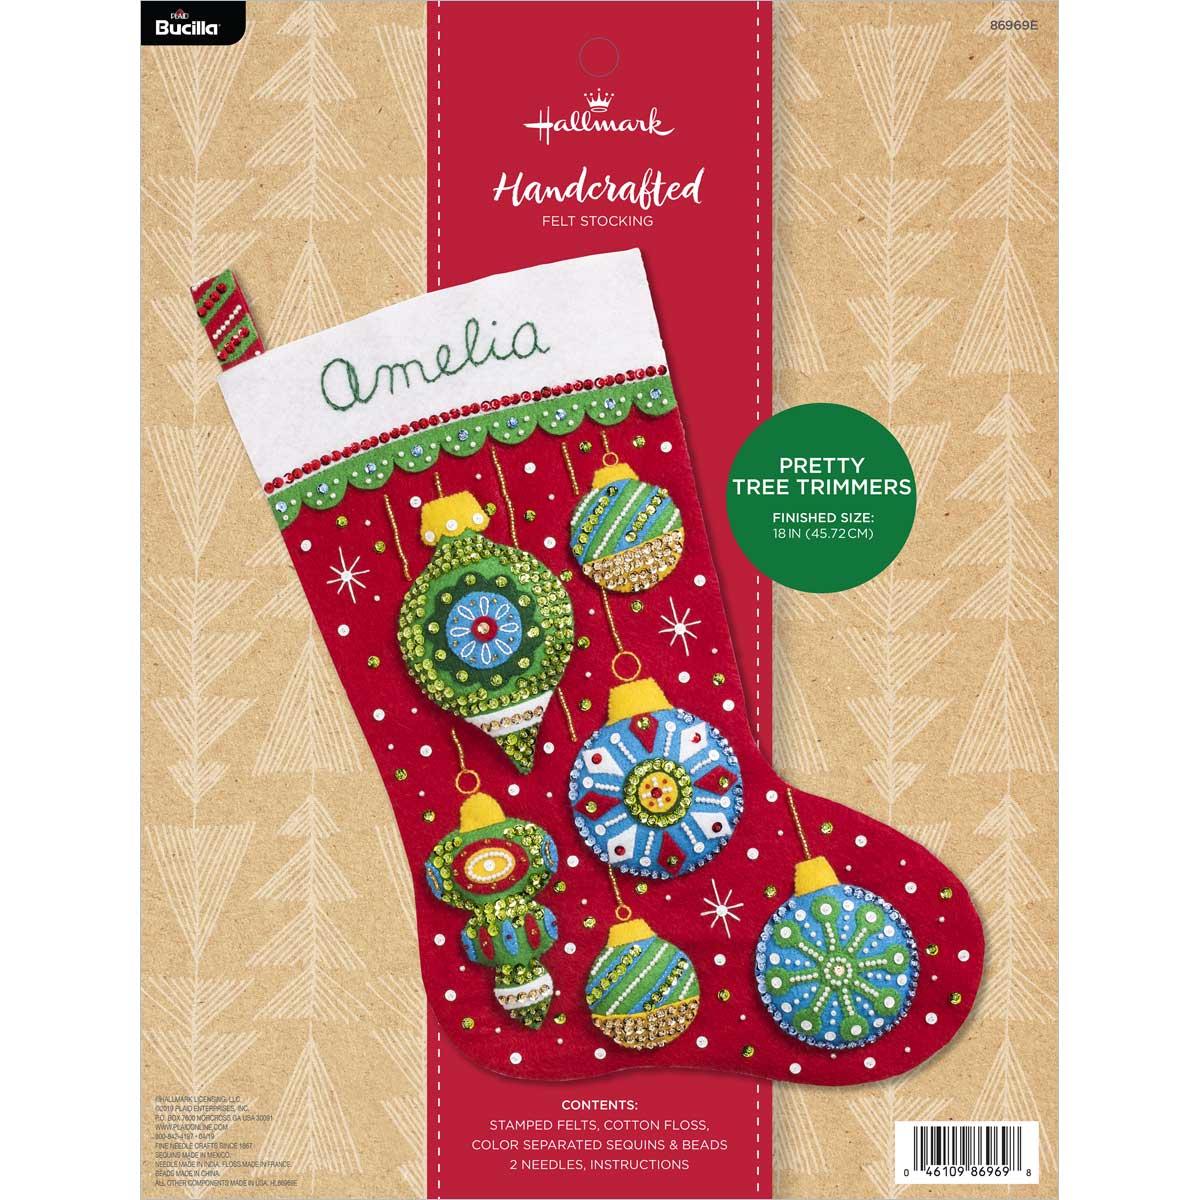 Bucilla ® Seasonal - Felt - Stocking Kits - Hallmark - Pretty Tree Trimmers - 86969E